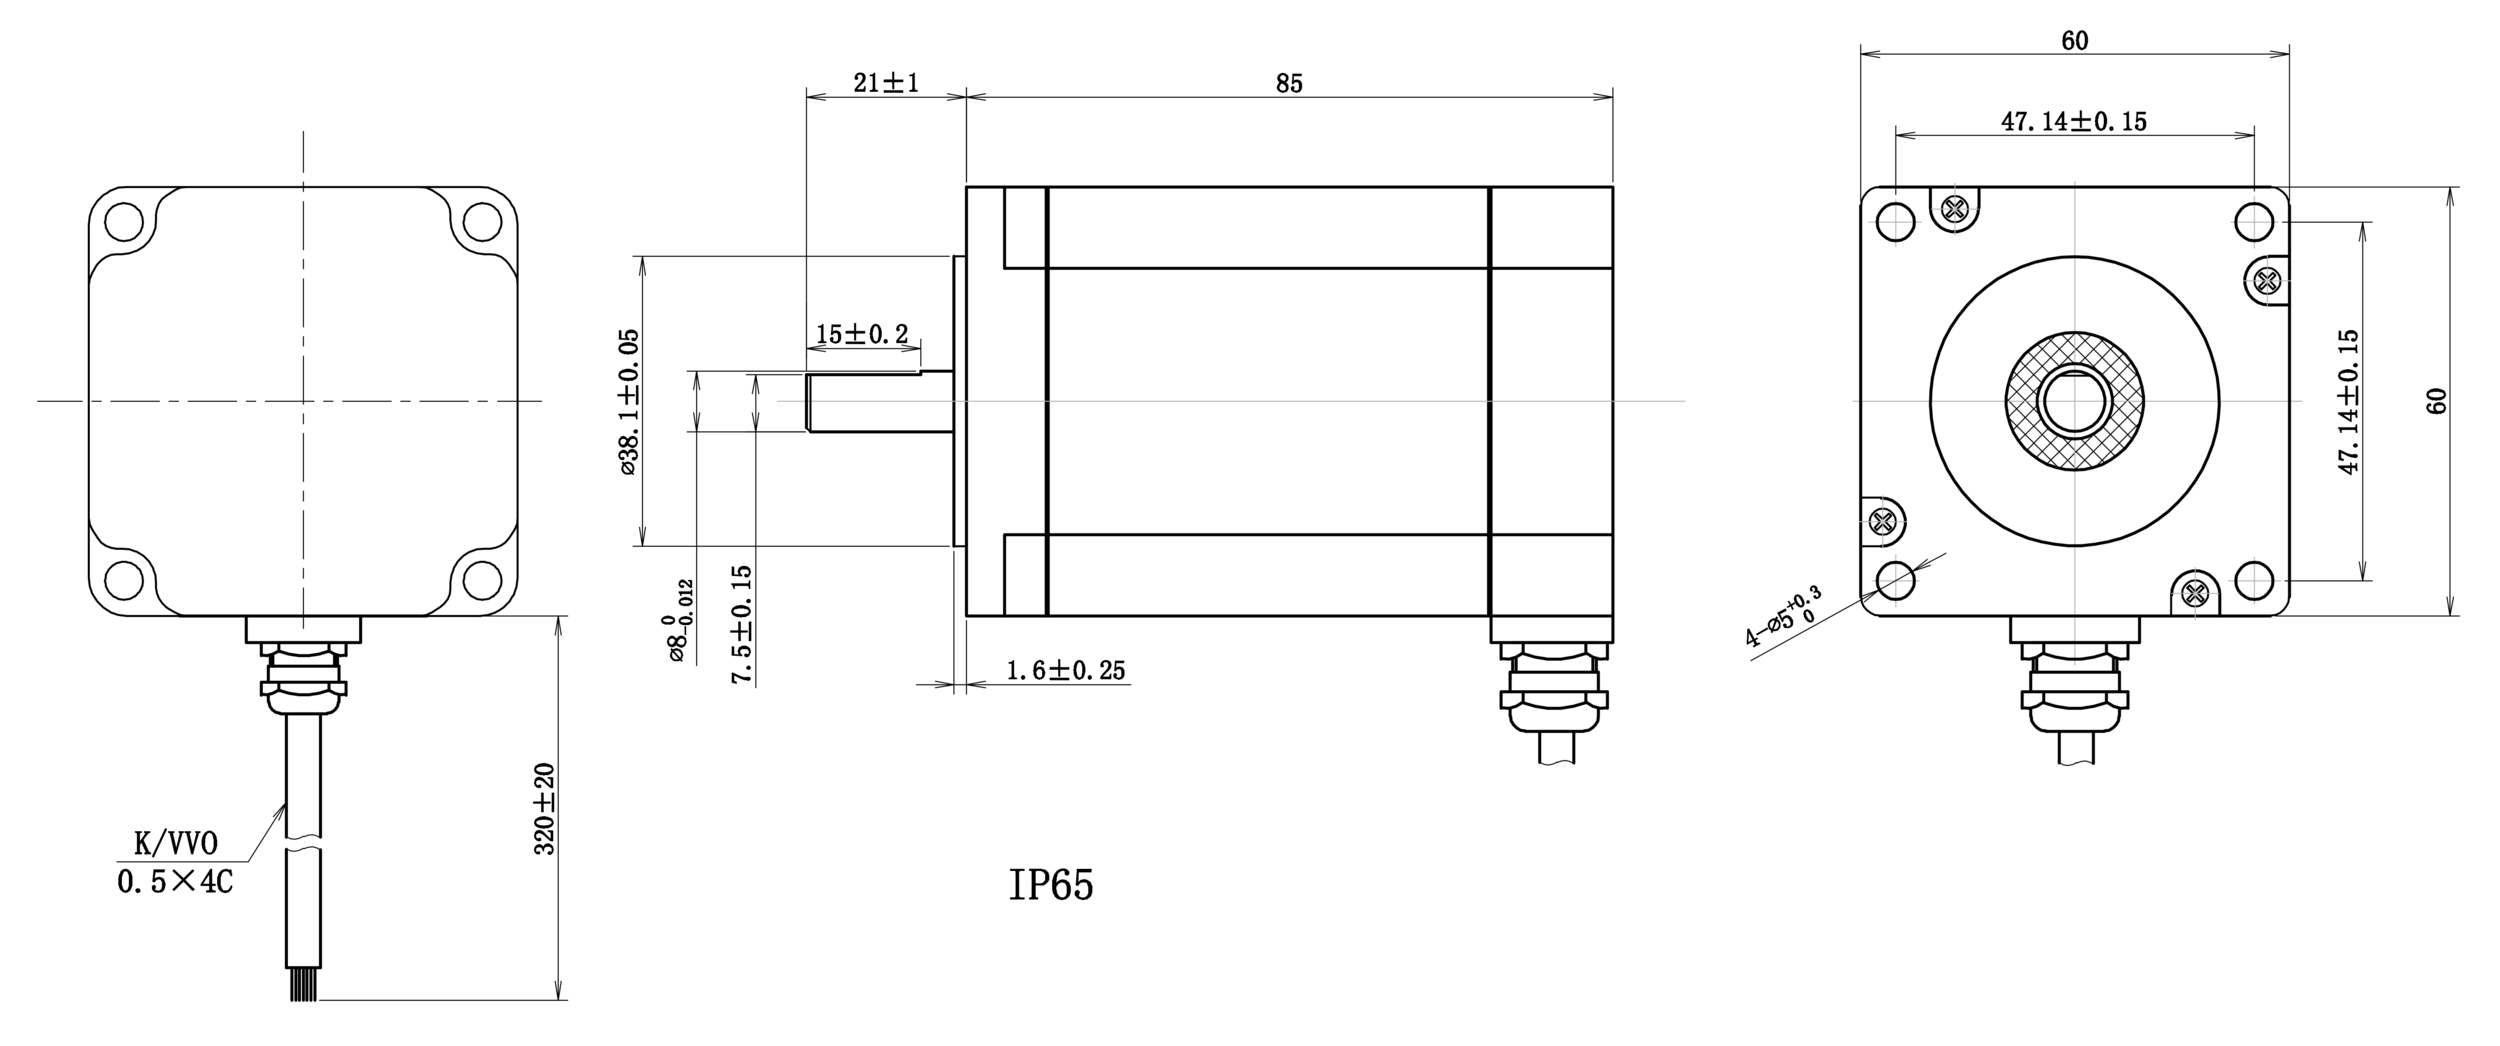 NEMA 24 IP65 Rotary Stepper Motor Drawing